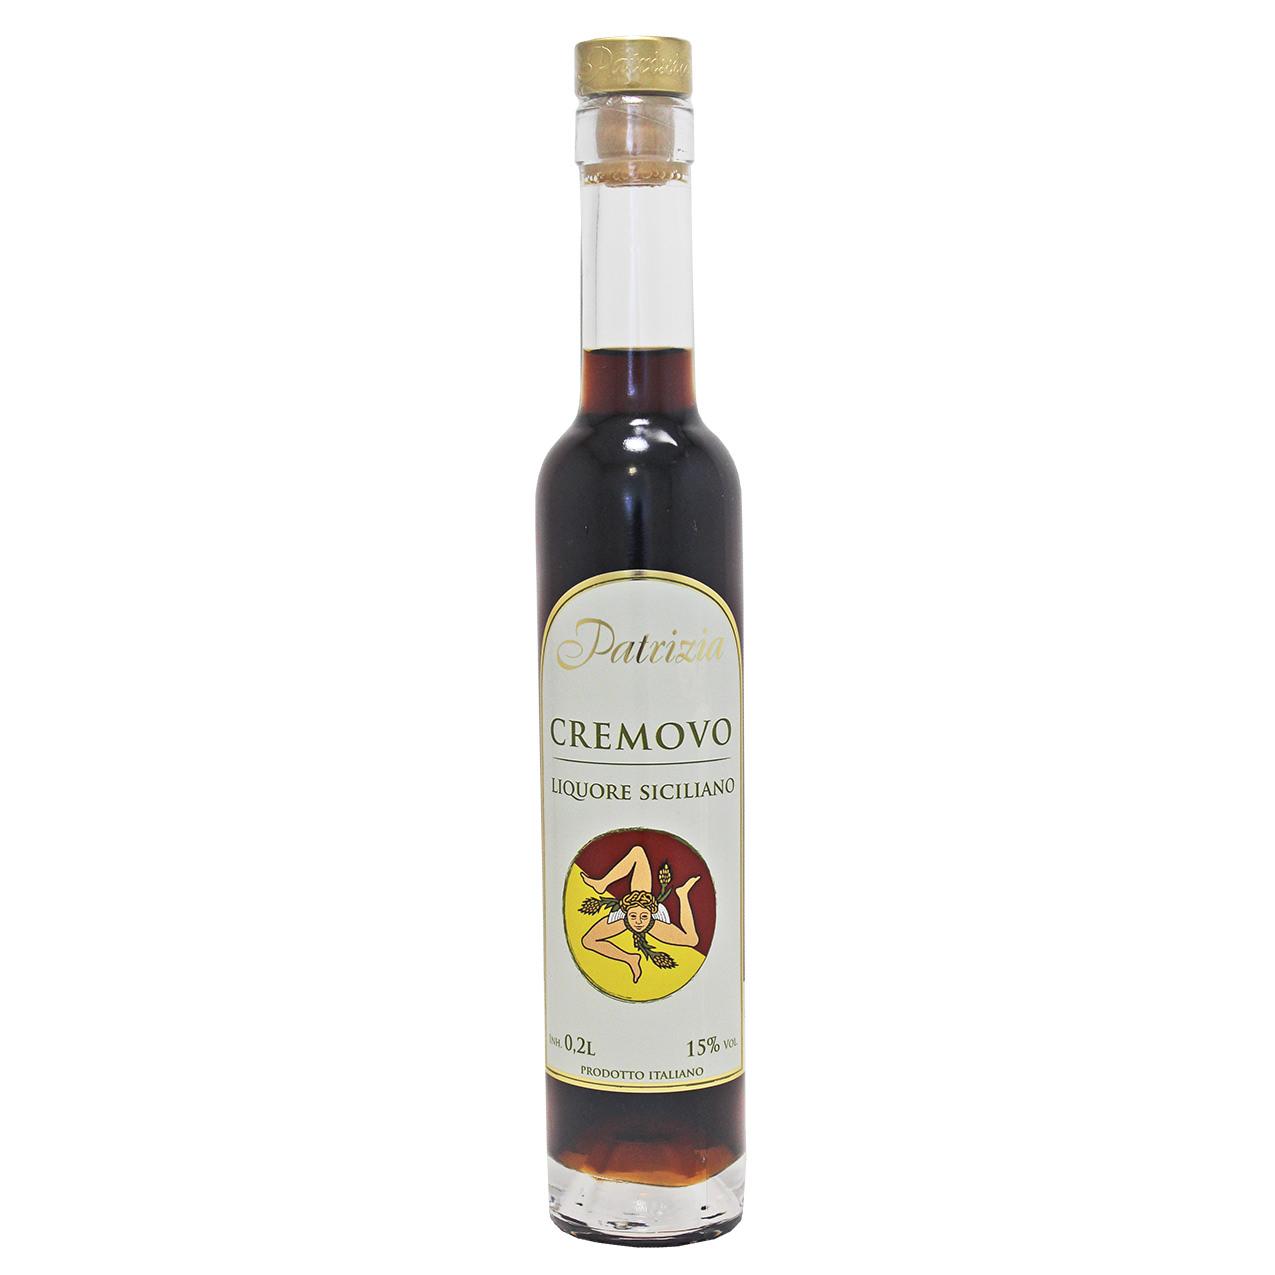 Cremovo - Sizilianischer Likör